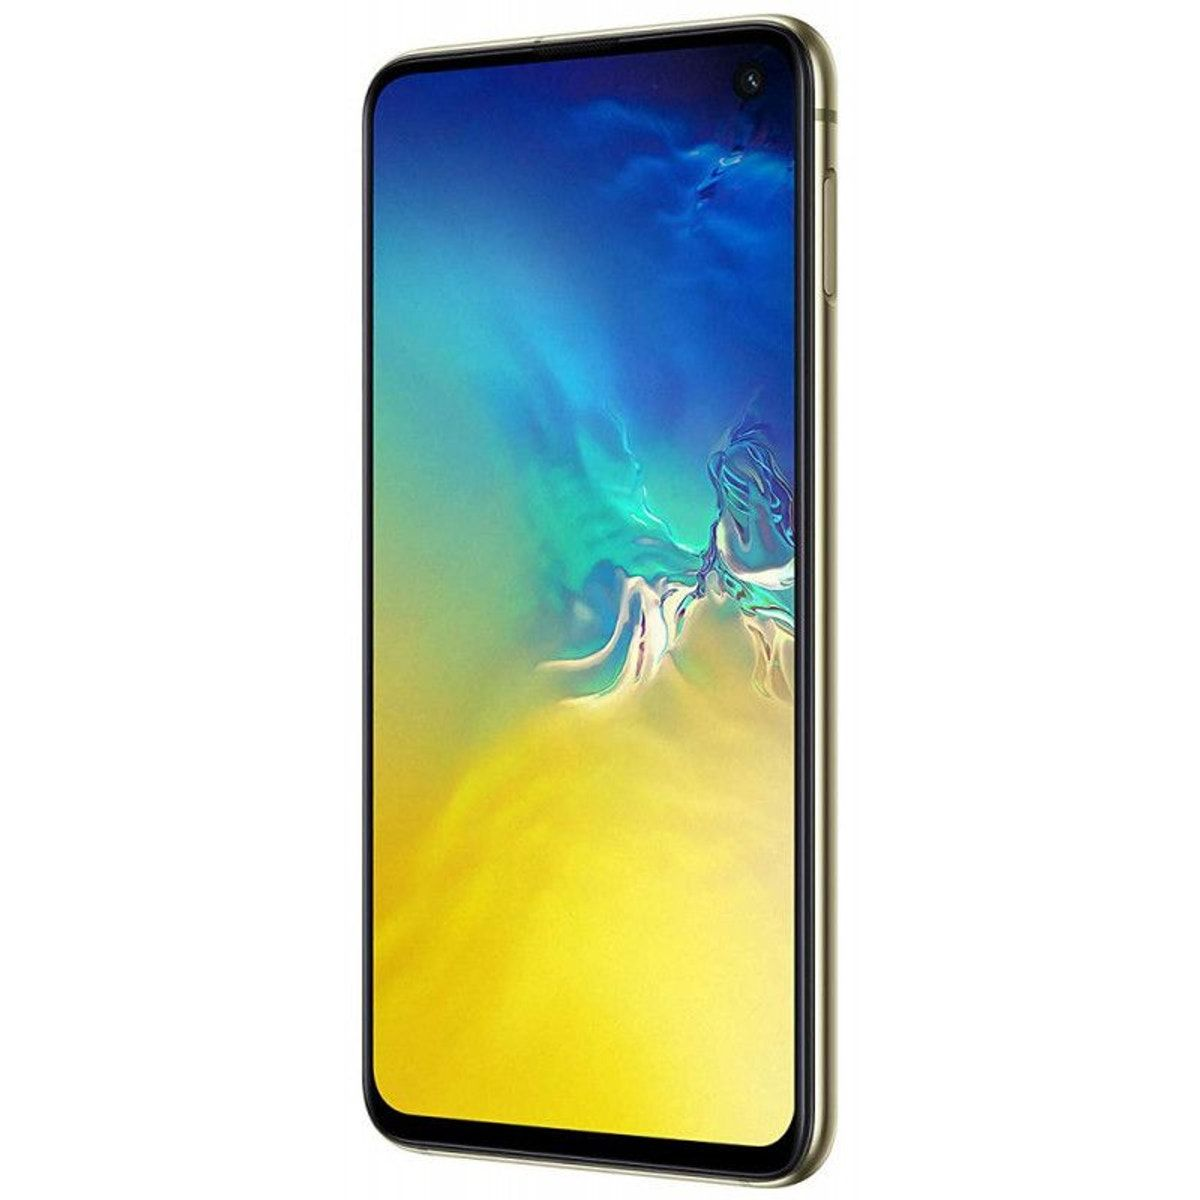 Smartphone Modele Galaxy S10e Double Sim 128go 6go Ram